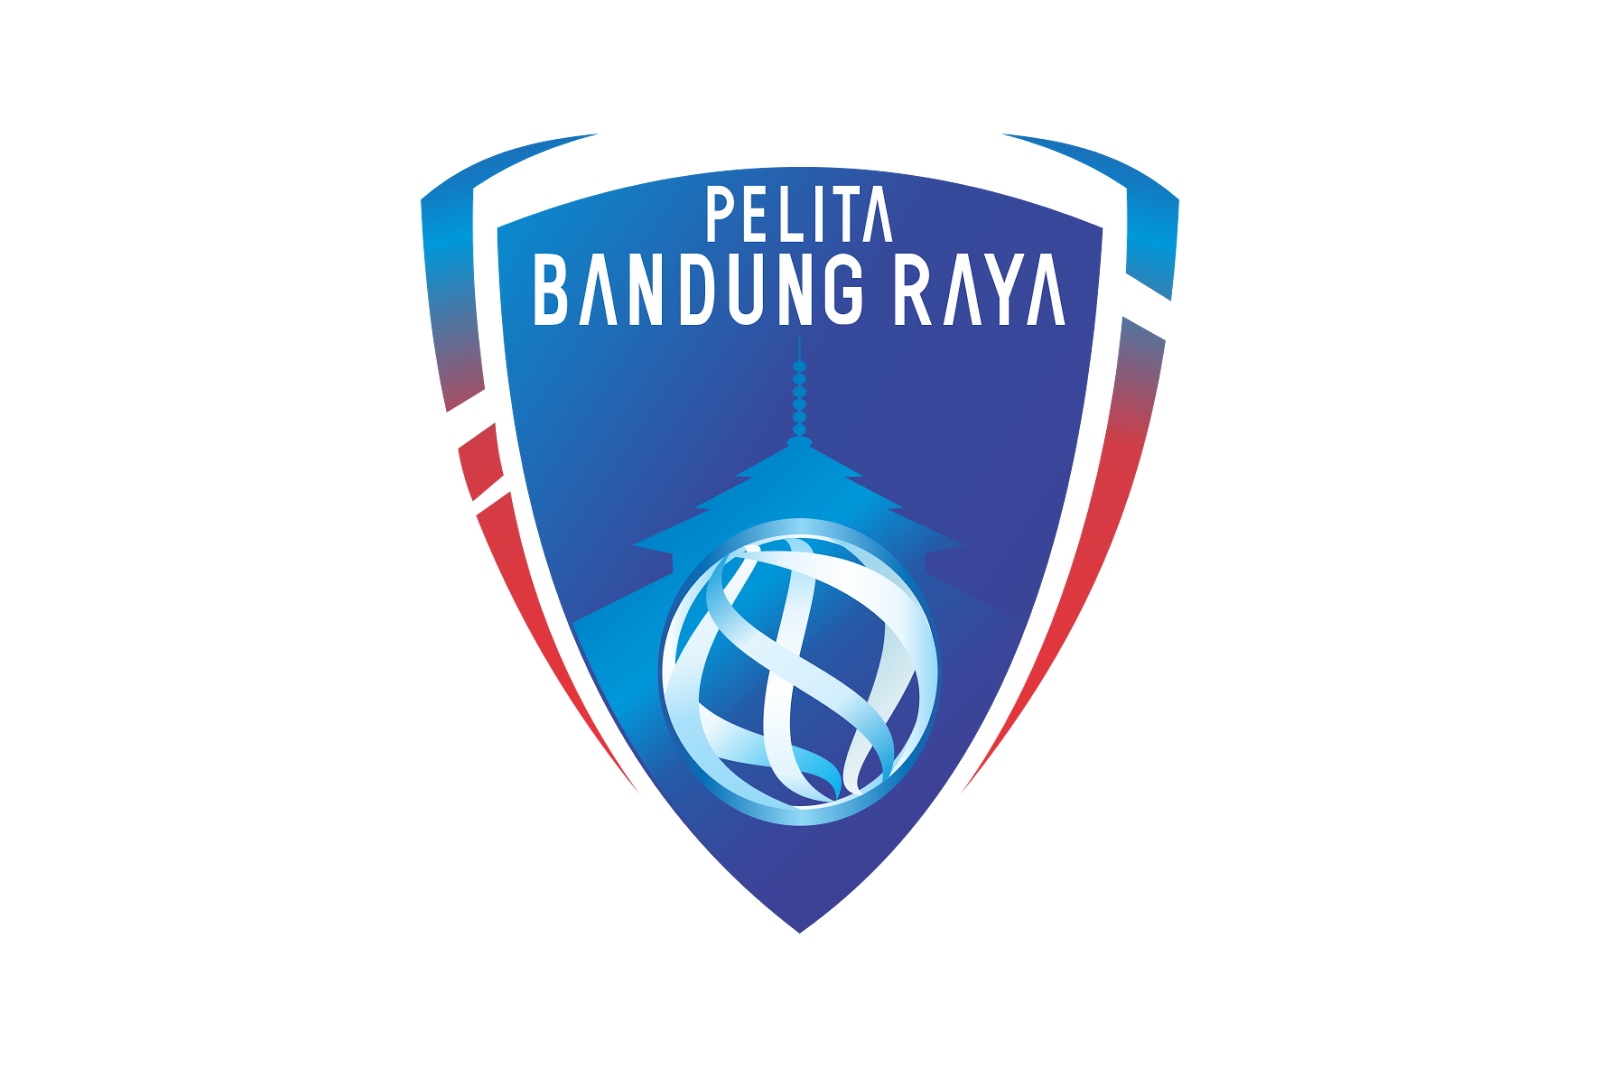 Logo Pelita Bandung Raya